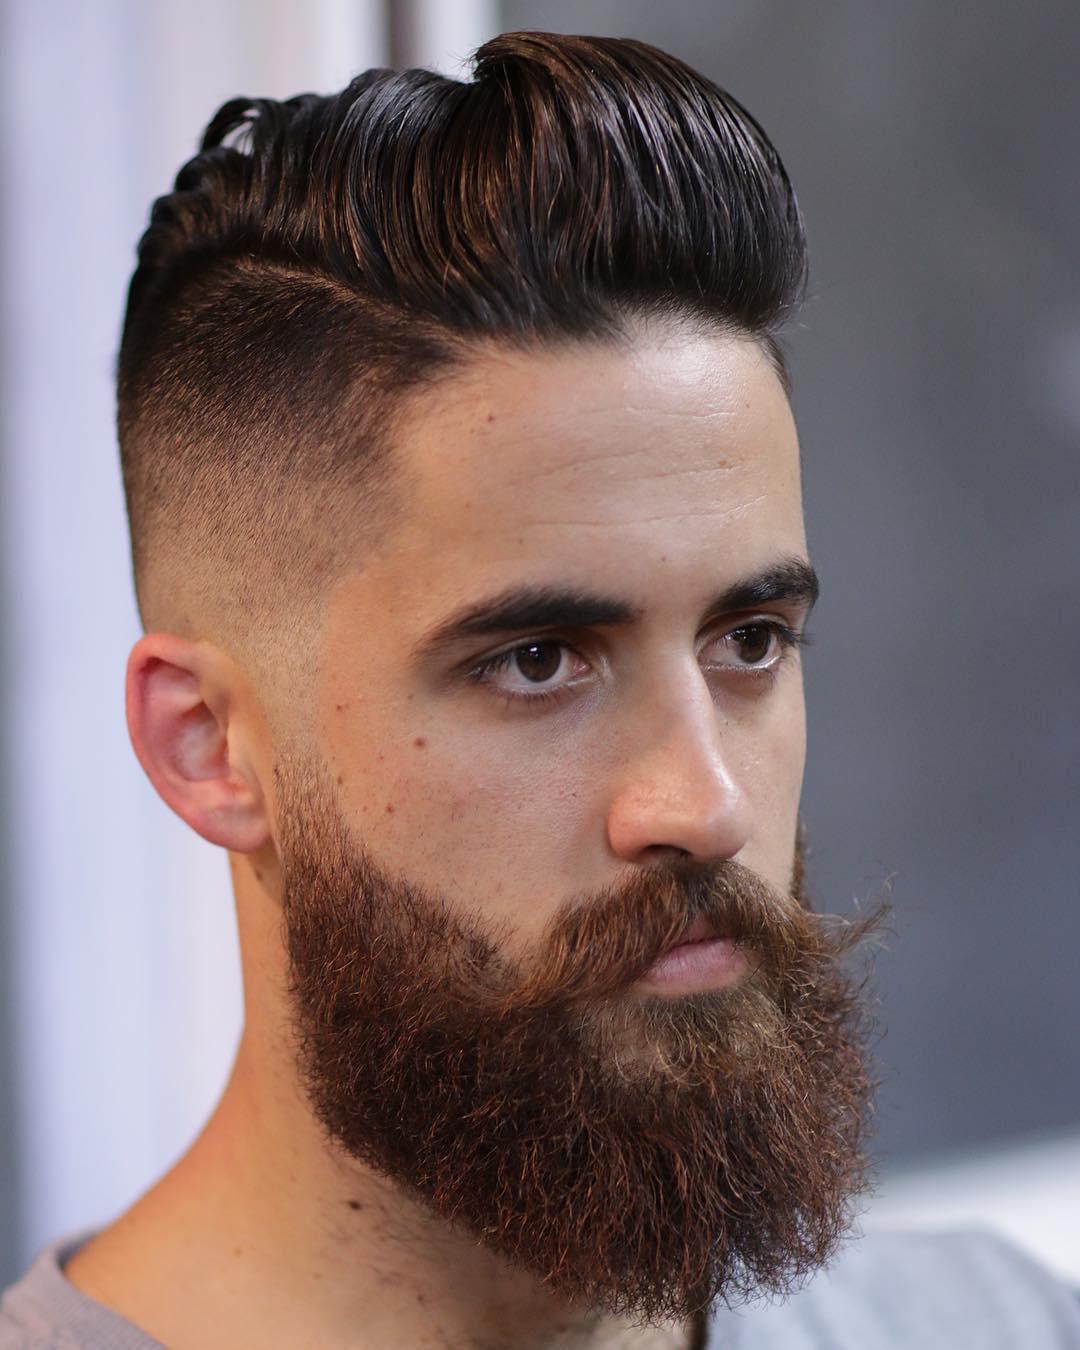 cutsbycameron beard style mustache style latest mens hairstyles 2018